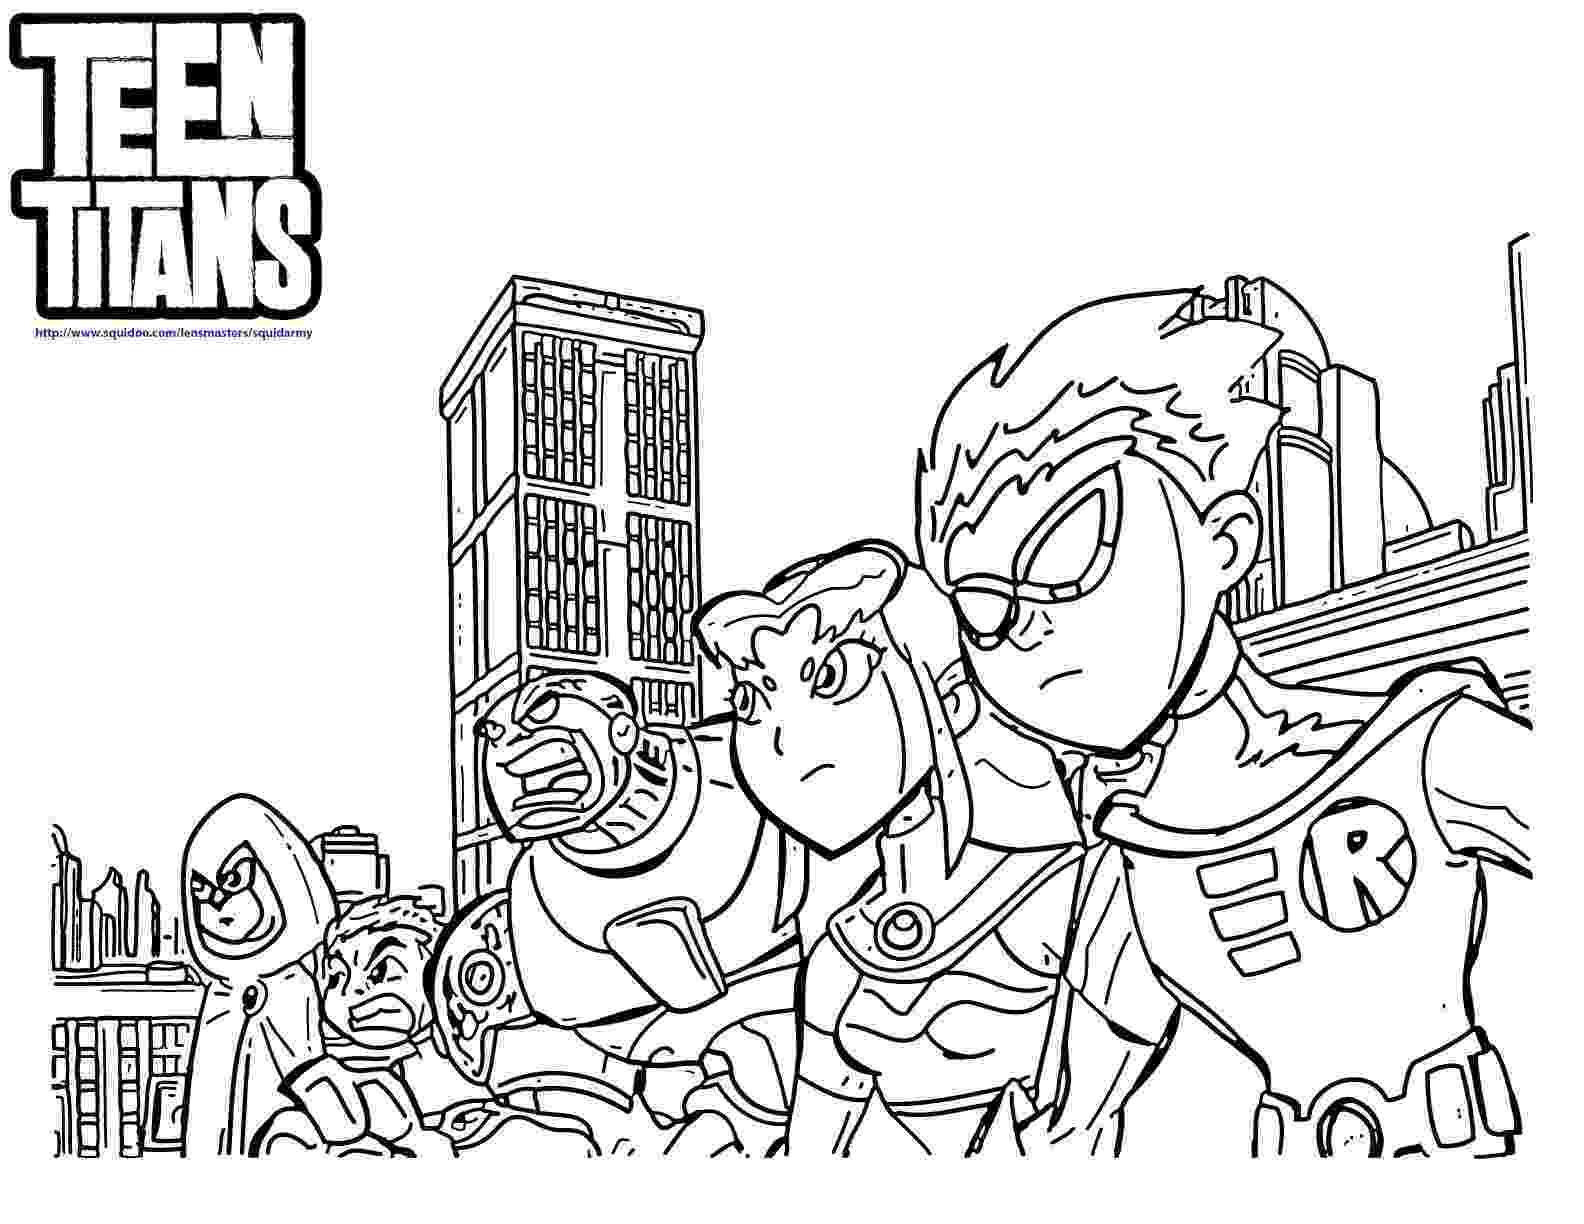 teen titans go coloring pages teen titans go coloring pages squid army coloring teen titans go pages